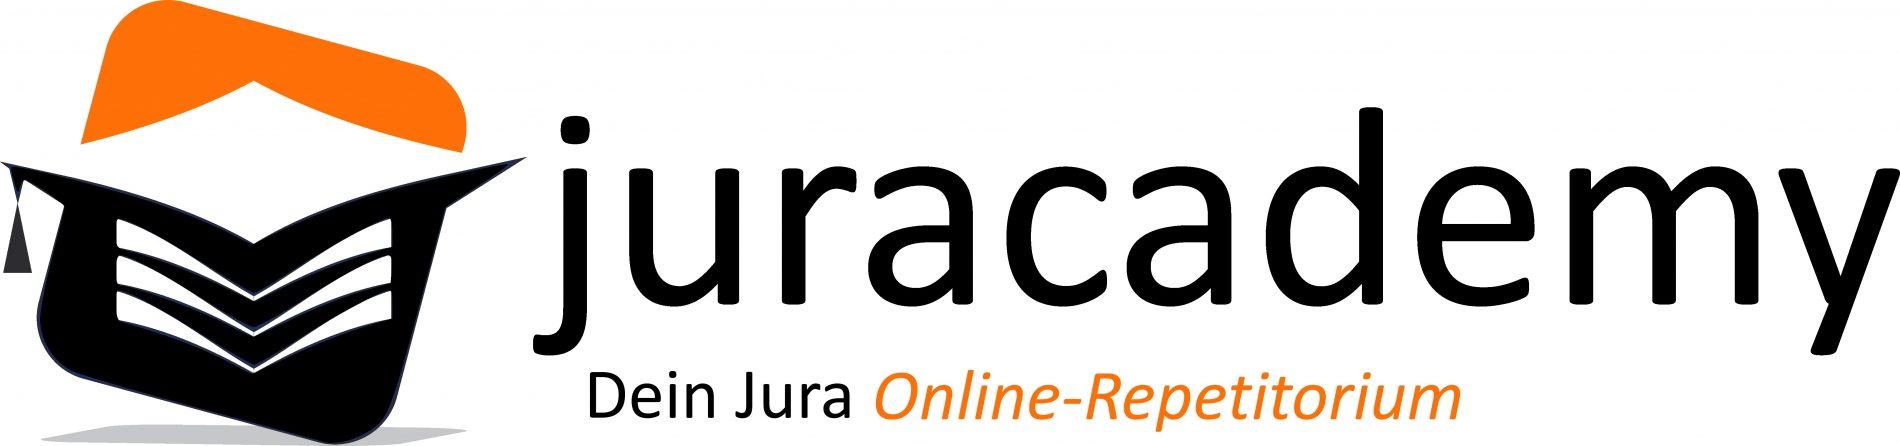 juracadamy_logo_neu